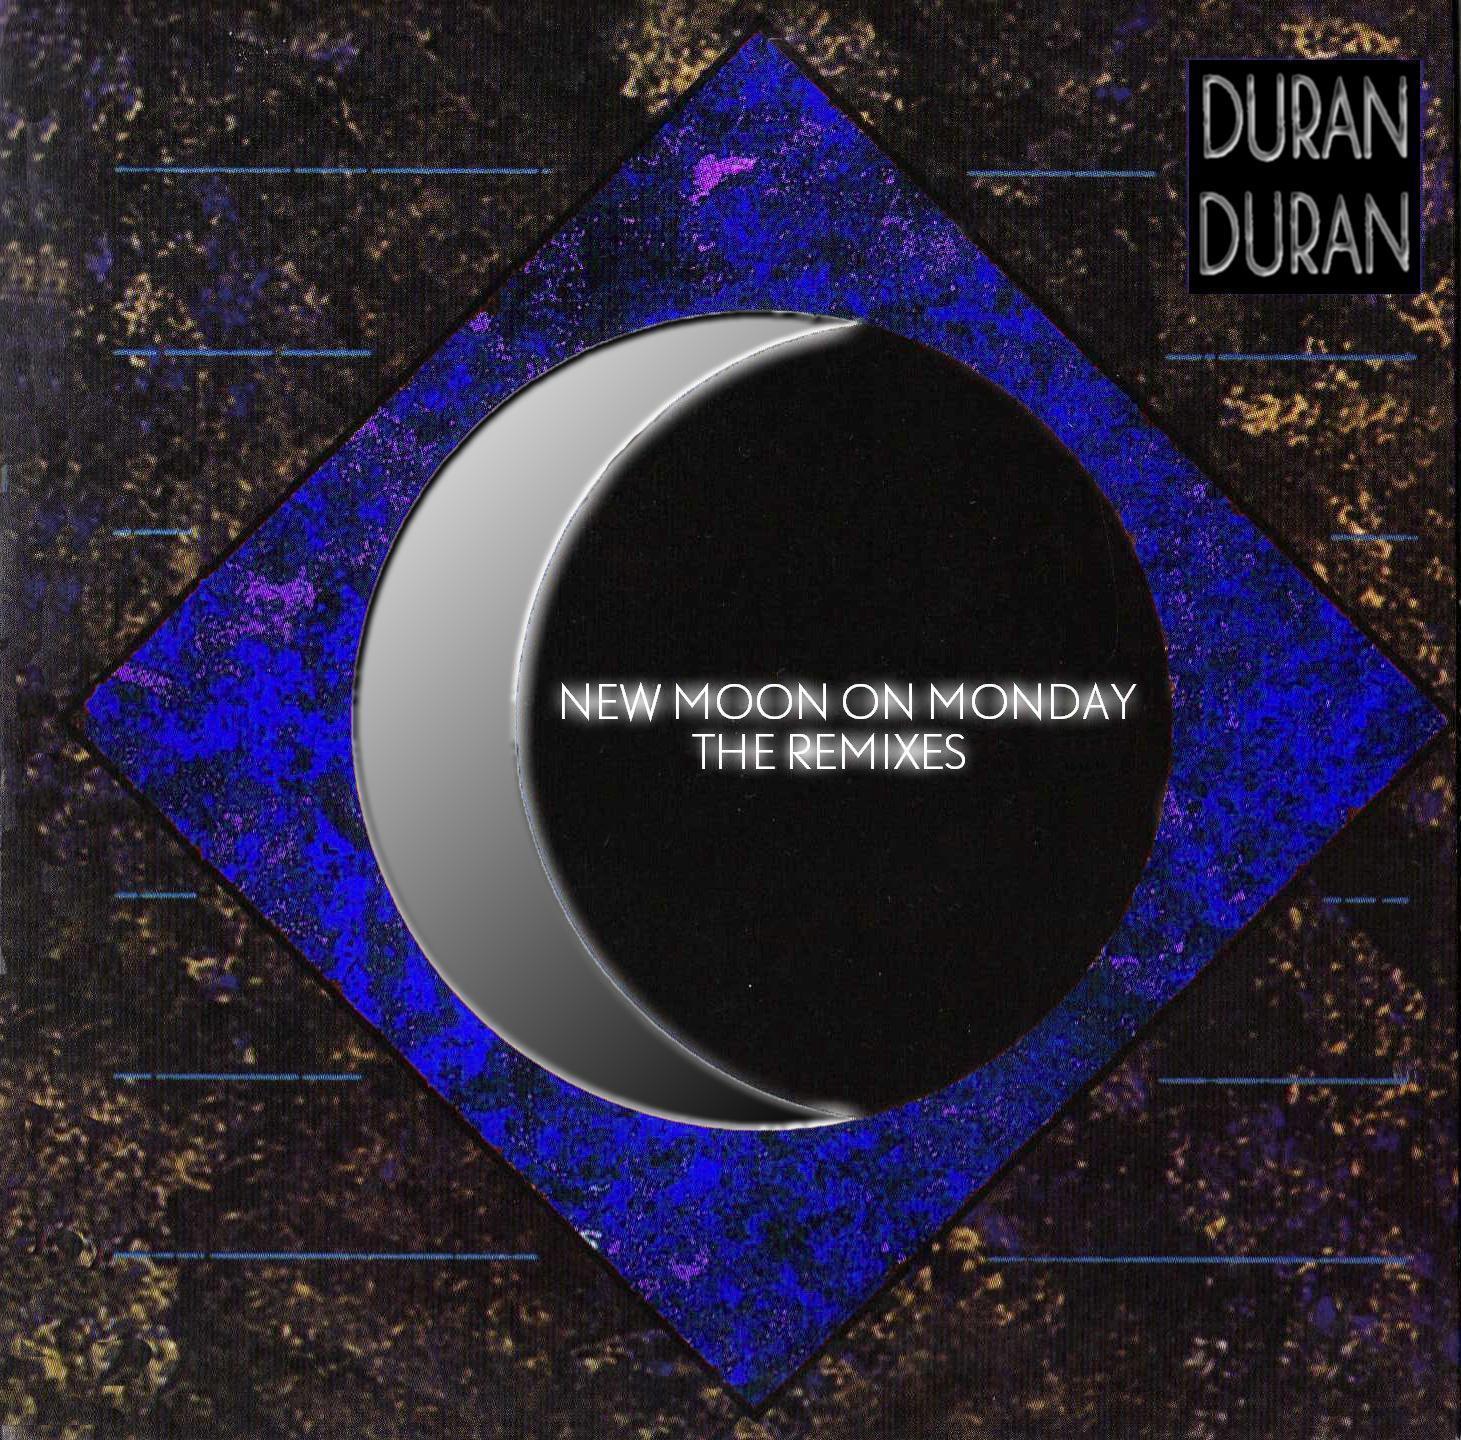 New moon on monday duran duran video